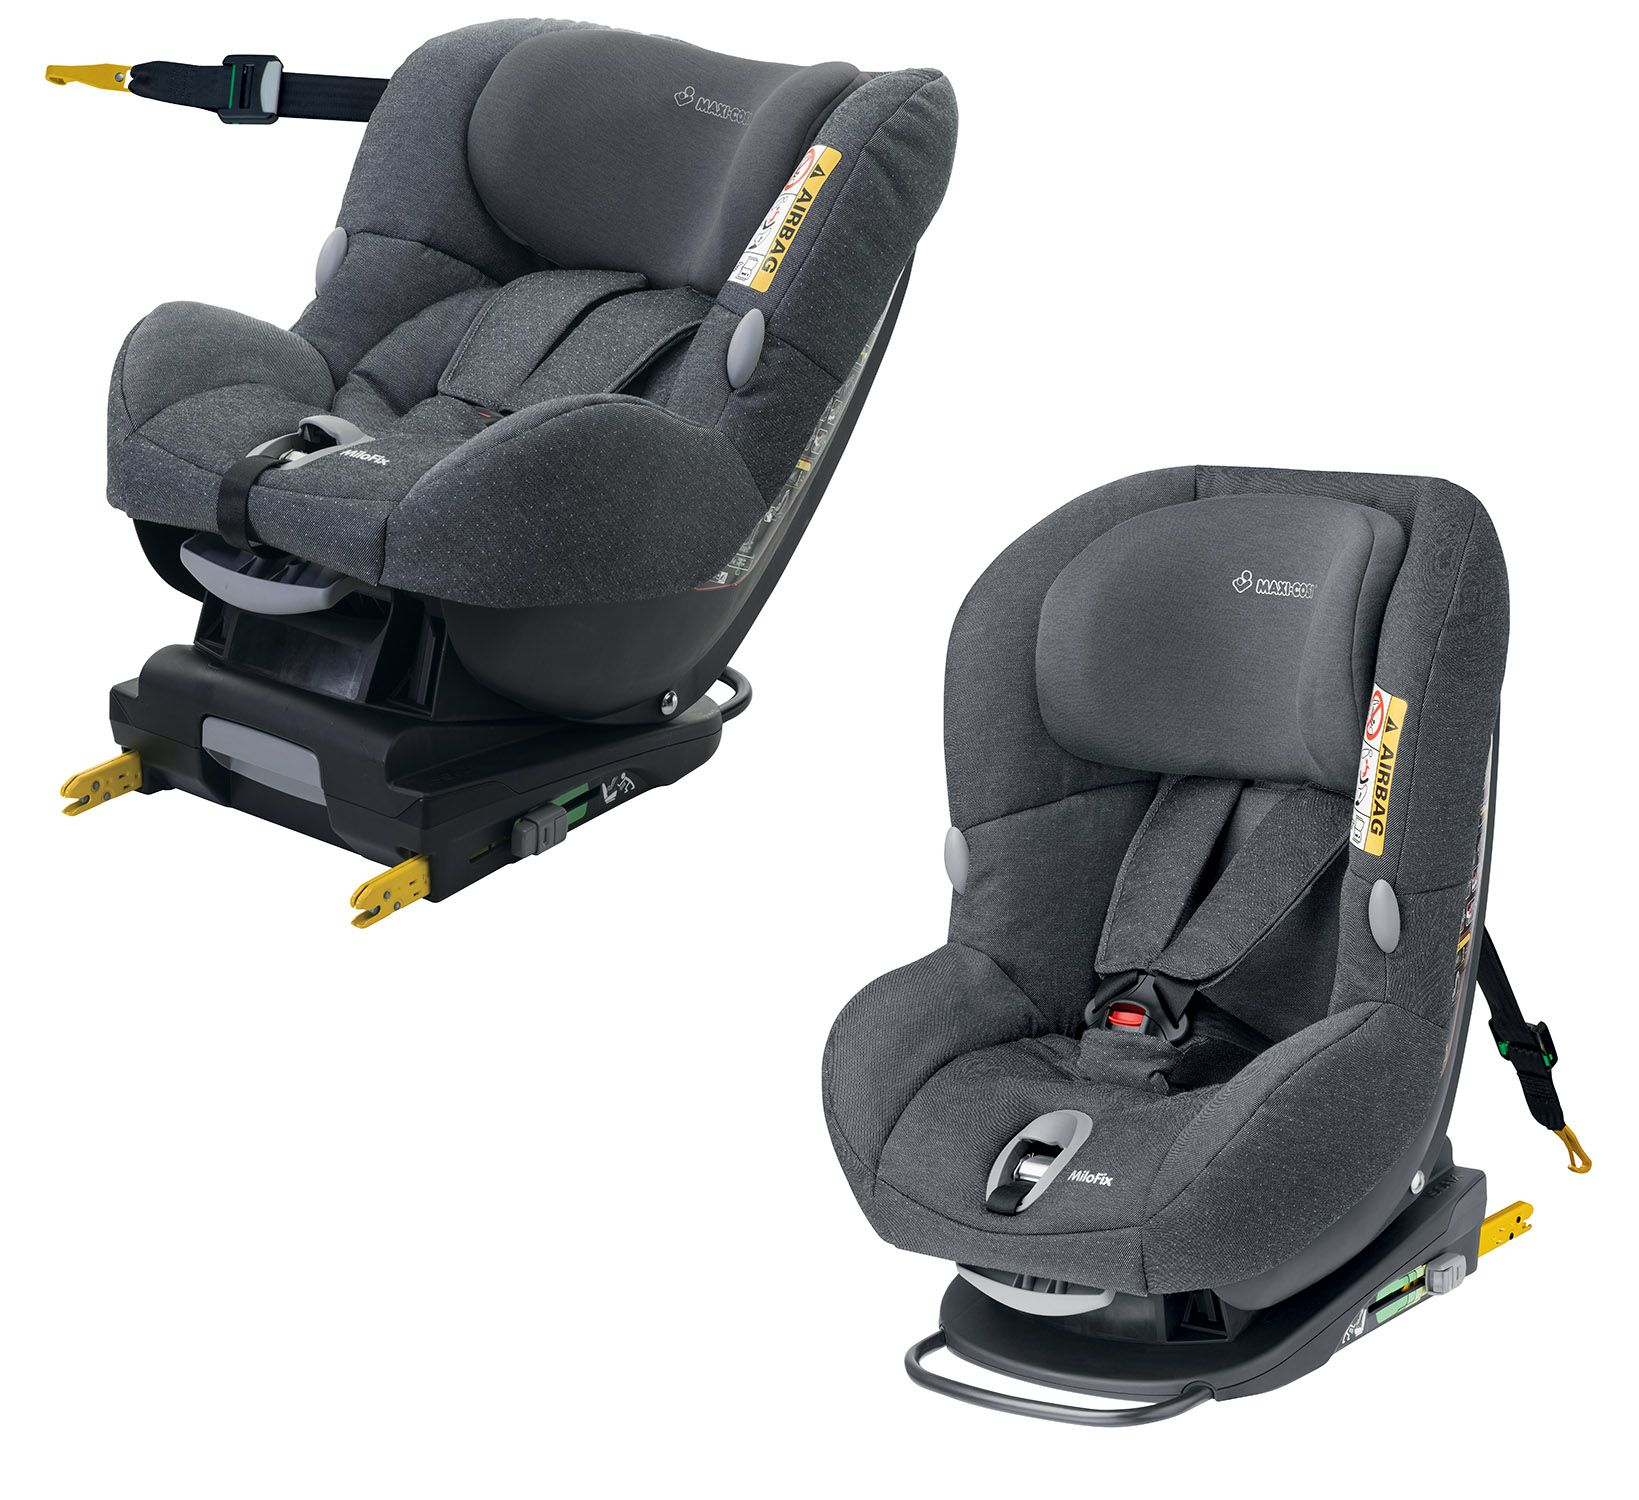 maxi cosi child car seat milofix 2018 sparkling grey buy at kidsroom car seats isofix. Black Bedroom Furniture Sets. Home Design Ideas